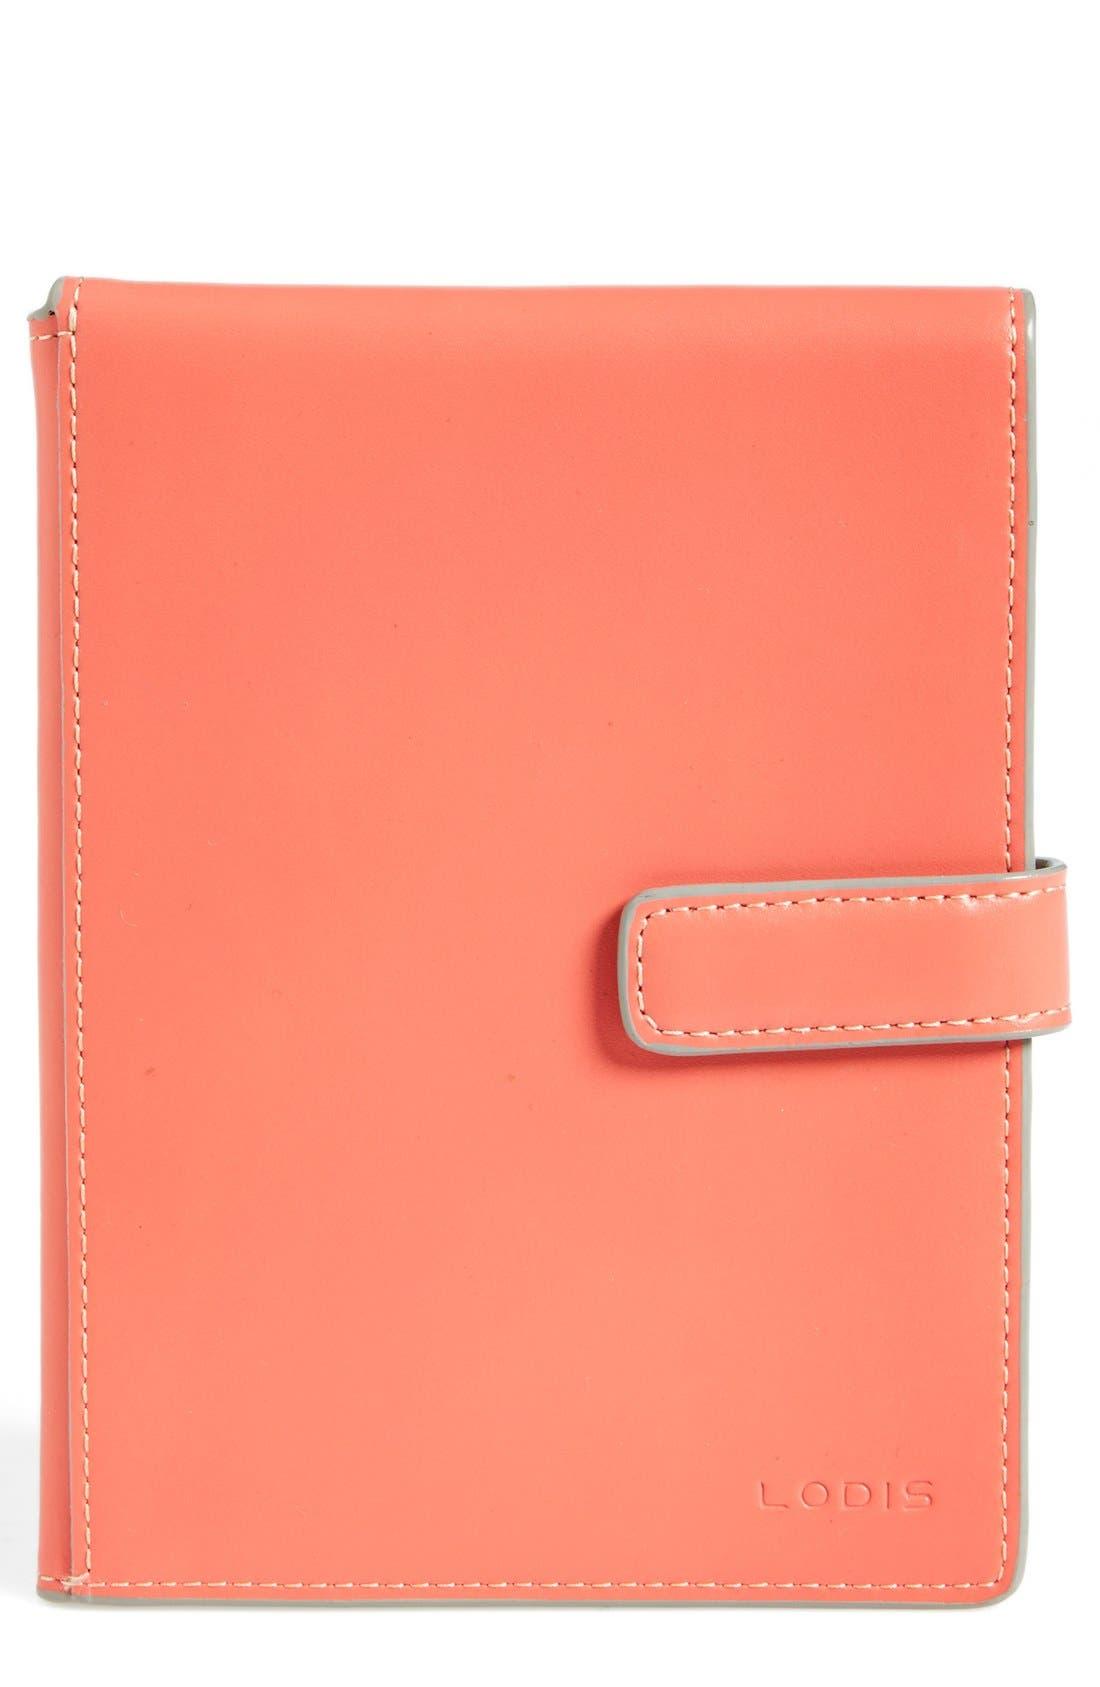 Alternate Image 1 Selected - Lodis 'Audrey' Passport Wallet